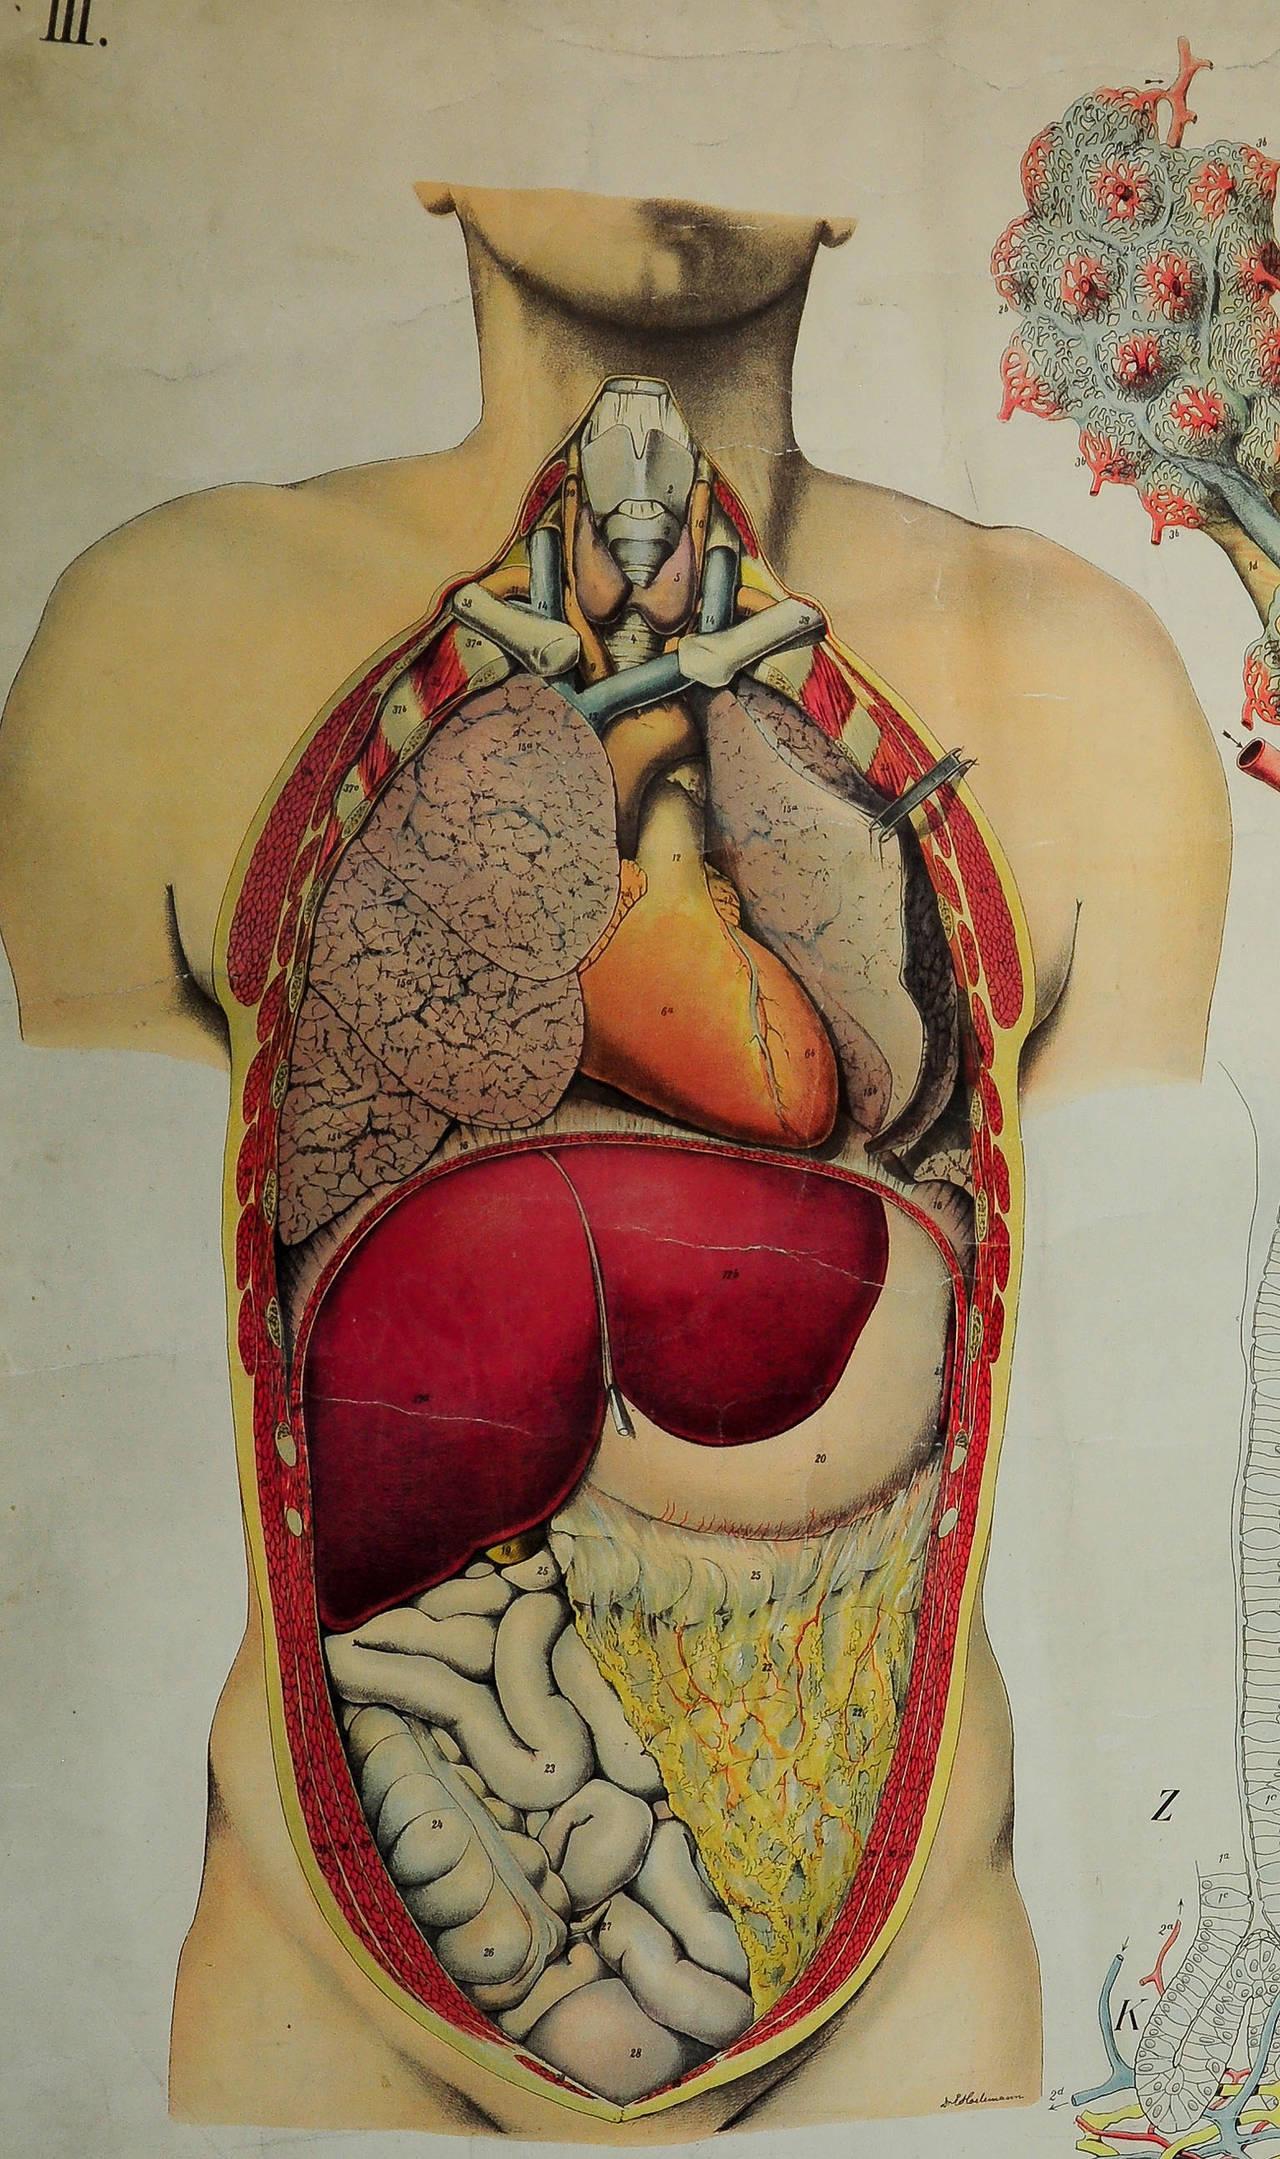 Wall chart of human anatomy